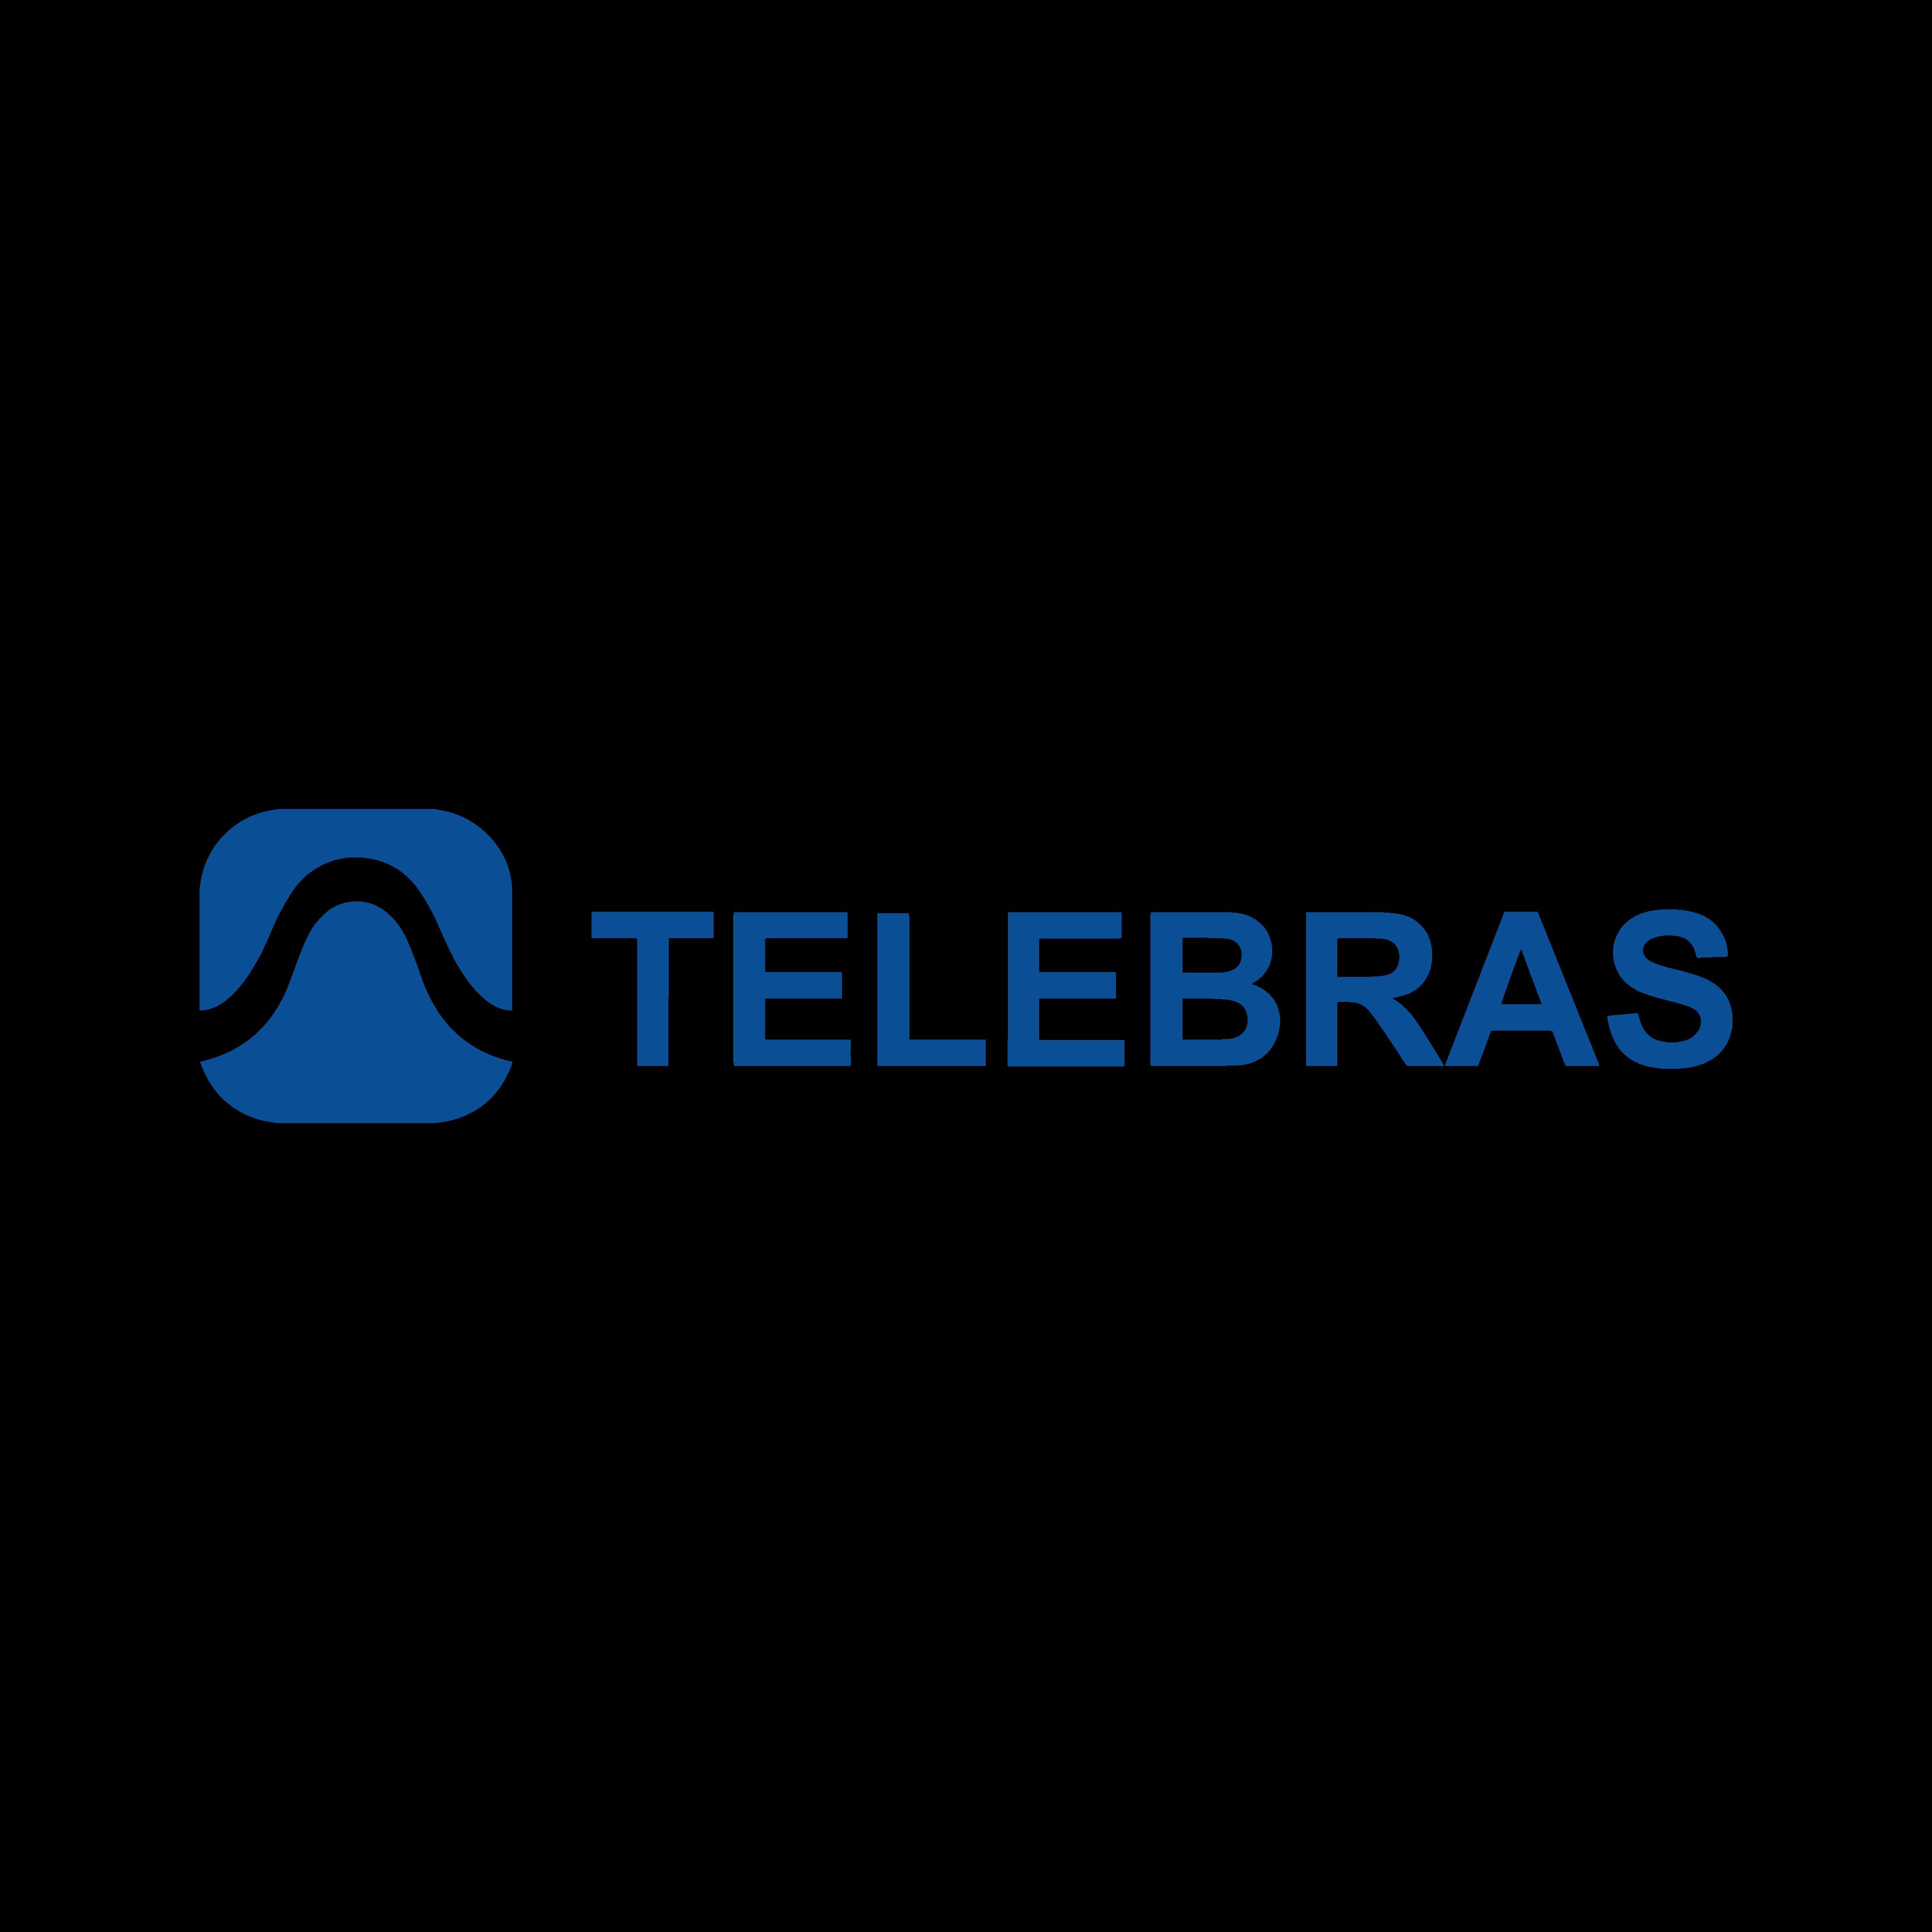 telebras logo 0 - Telebras Logo